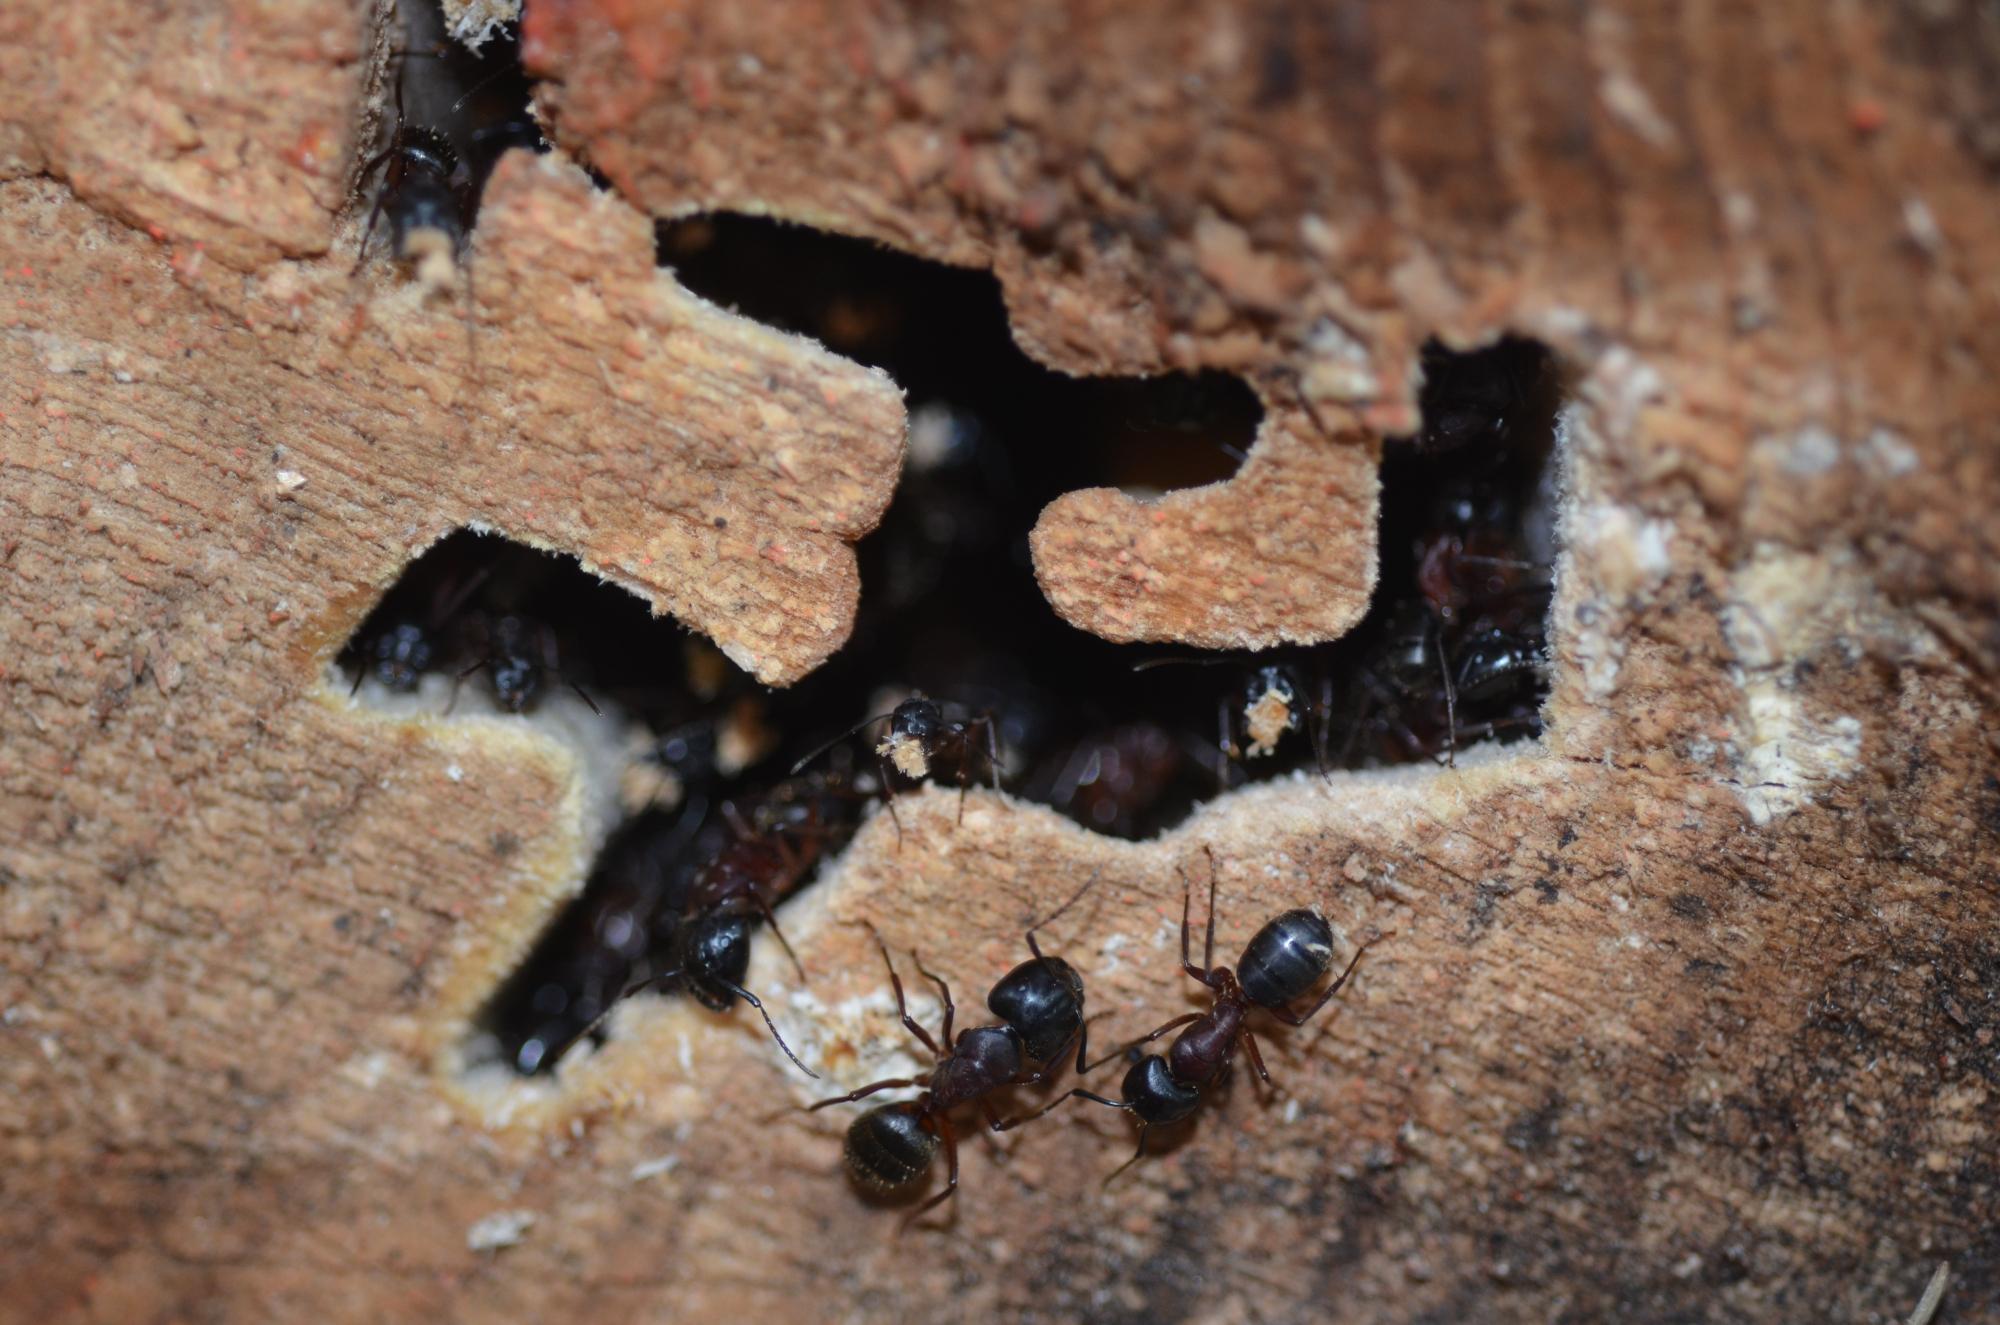 Bioholz ameisen